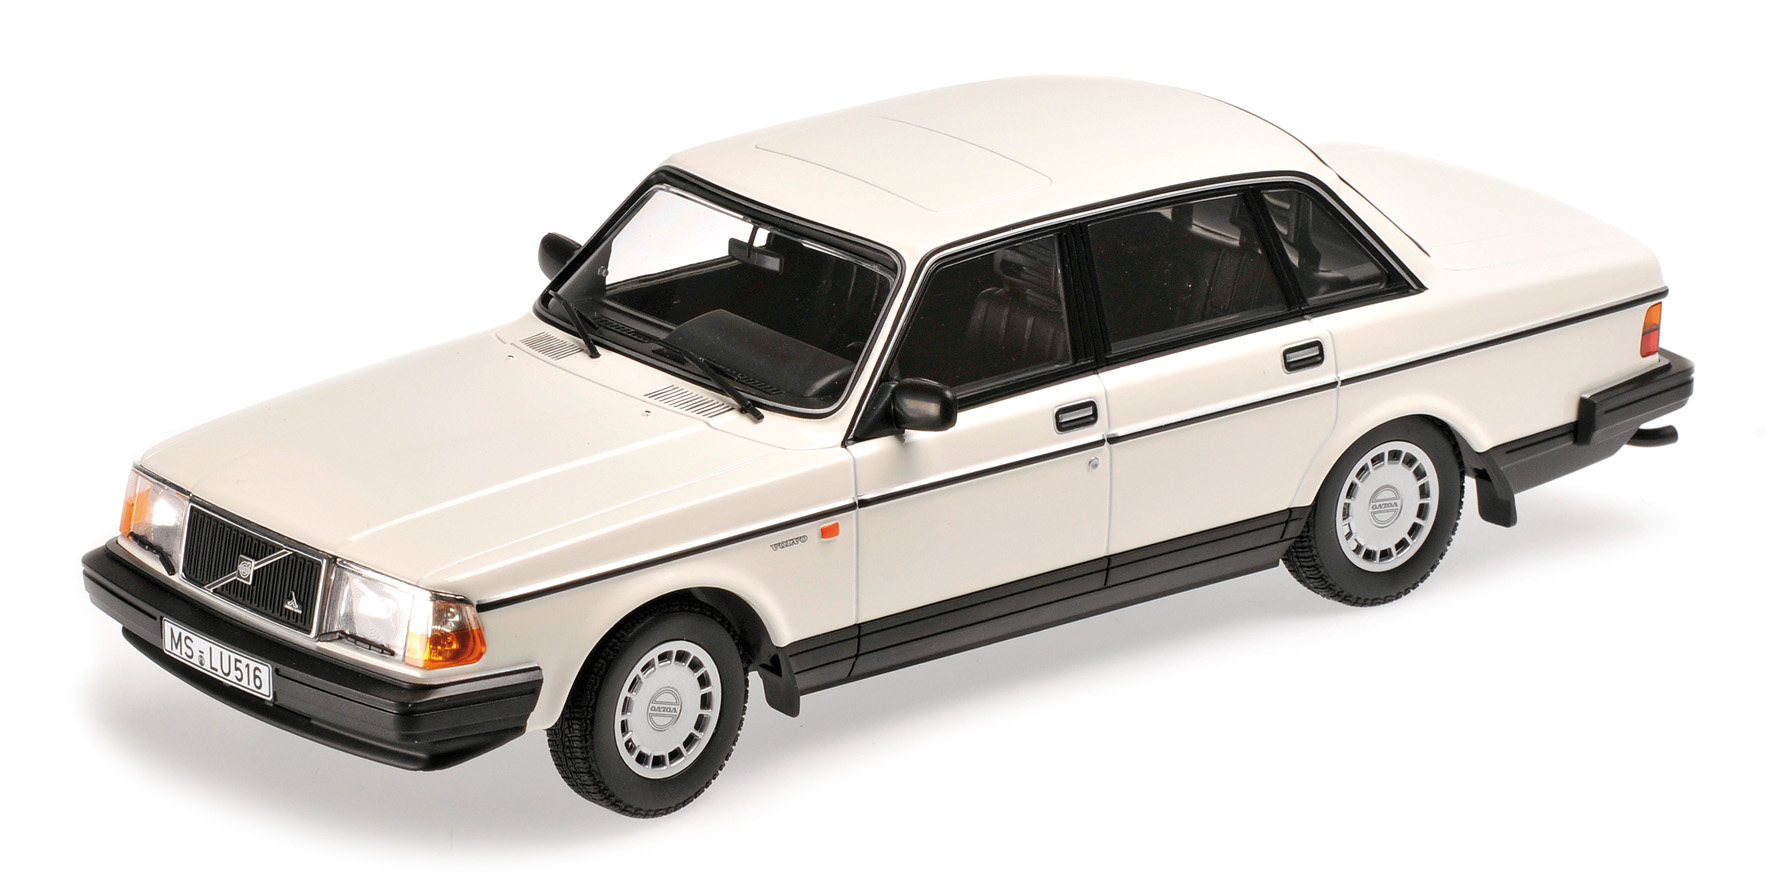 1986 volvo 240 dl sedan 1 18 scale by minichamps choice gear. Black Bedroom Furniture Sets. Home Design Ideas